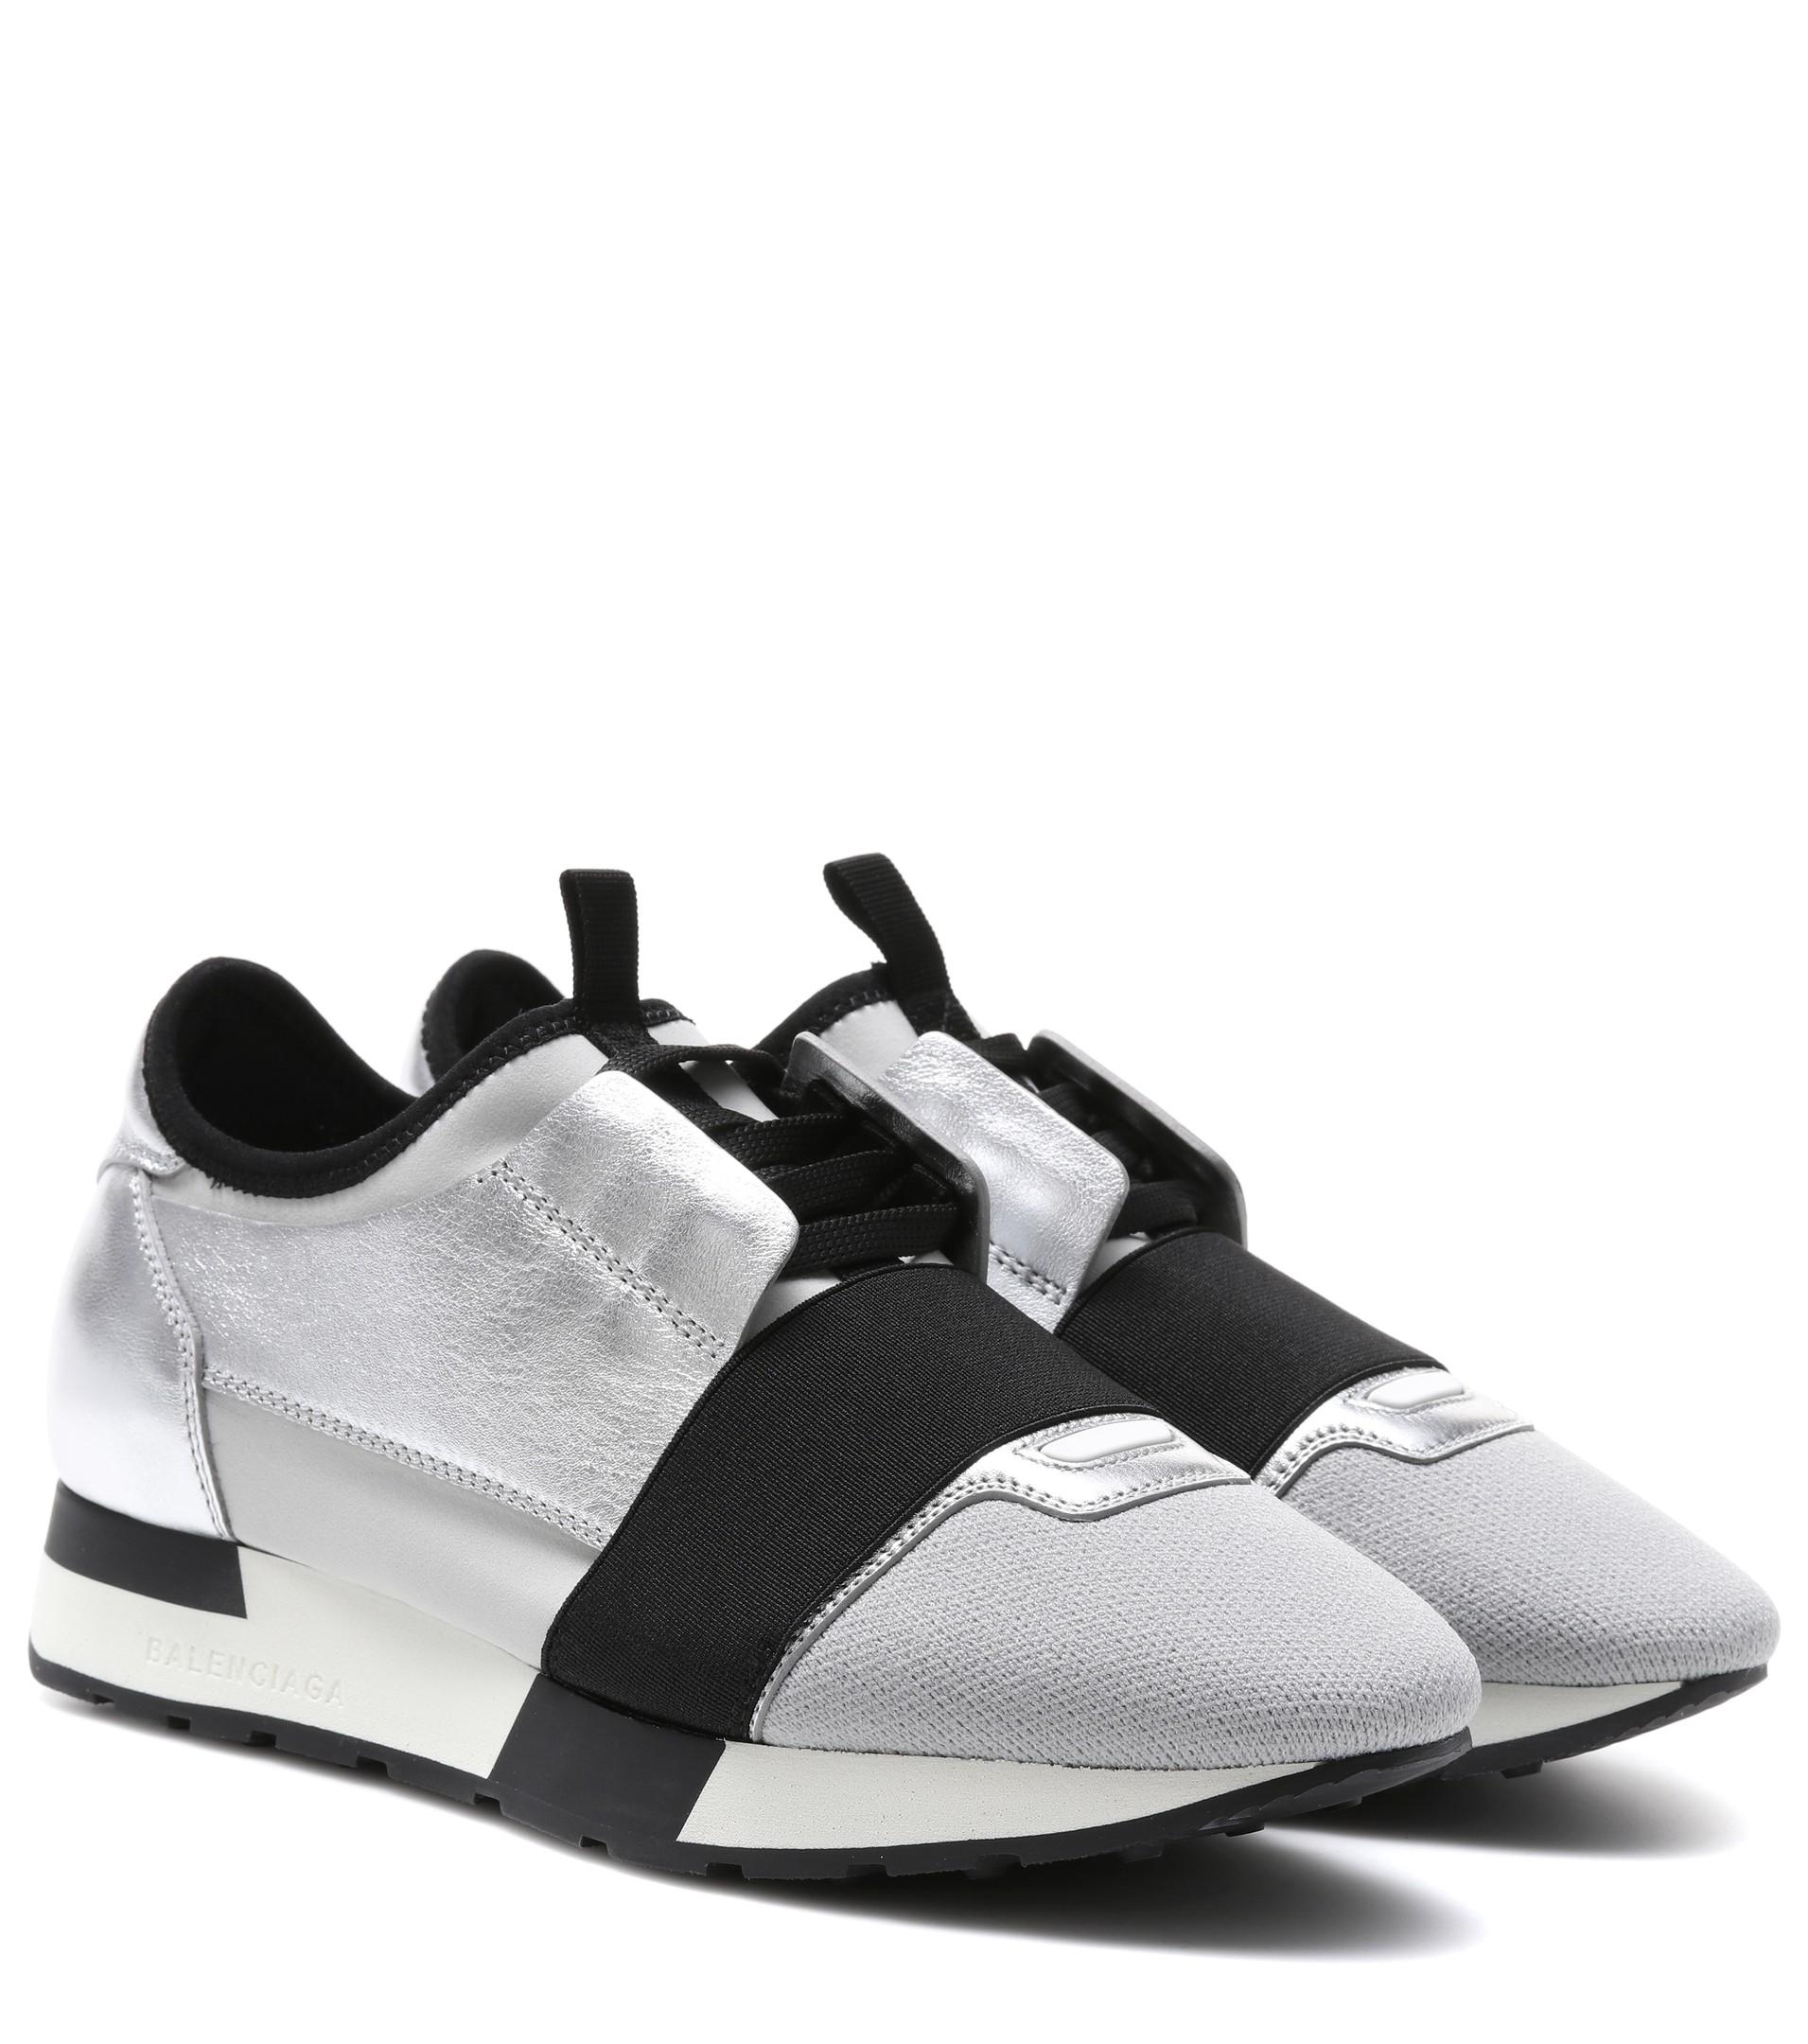 <a href='https://www.mytheresa.com/euro_en/balenciaga-race-runner-metallic-leather-sneakers-847883.html?catref=category#&gid=1&pid=1r' target='_blank' rel='noopener noreferrer'>Balenciaga</a></p><a href='https://www.net-a-porter.com/hu/en/product/879394/reebok/classic-metallic-crinkled-leather-sneakers' target='_blank' rel='noopener noreferrer'>Reebok</a></p>